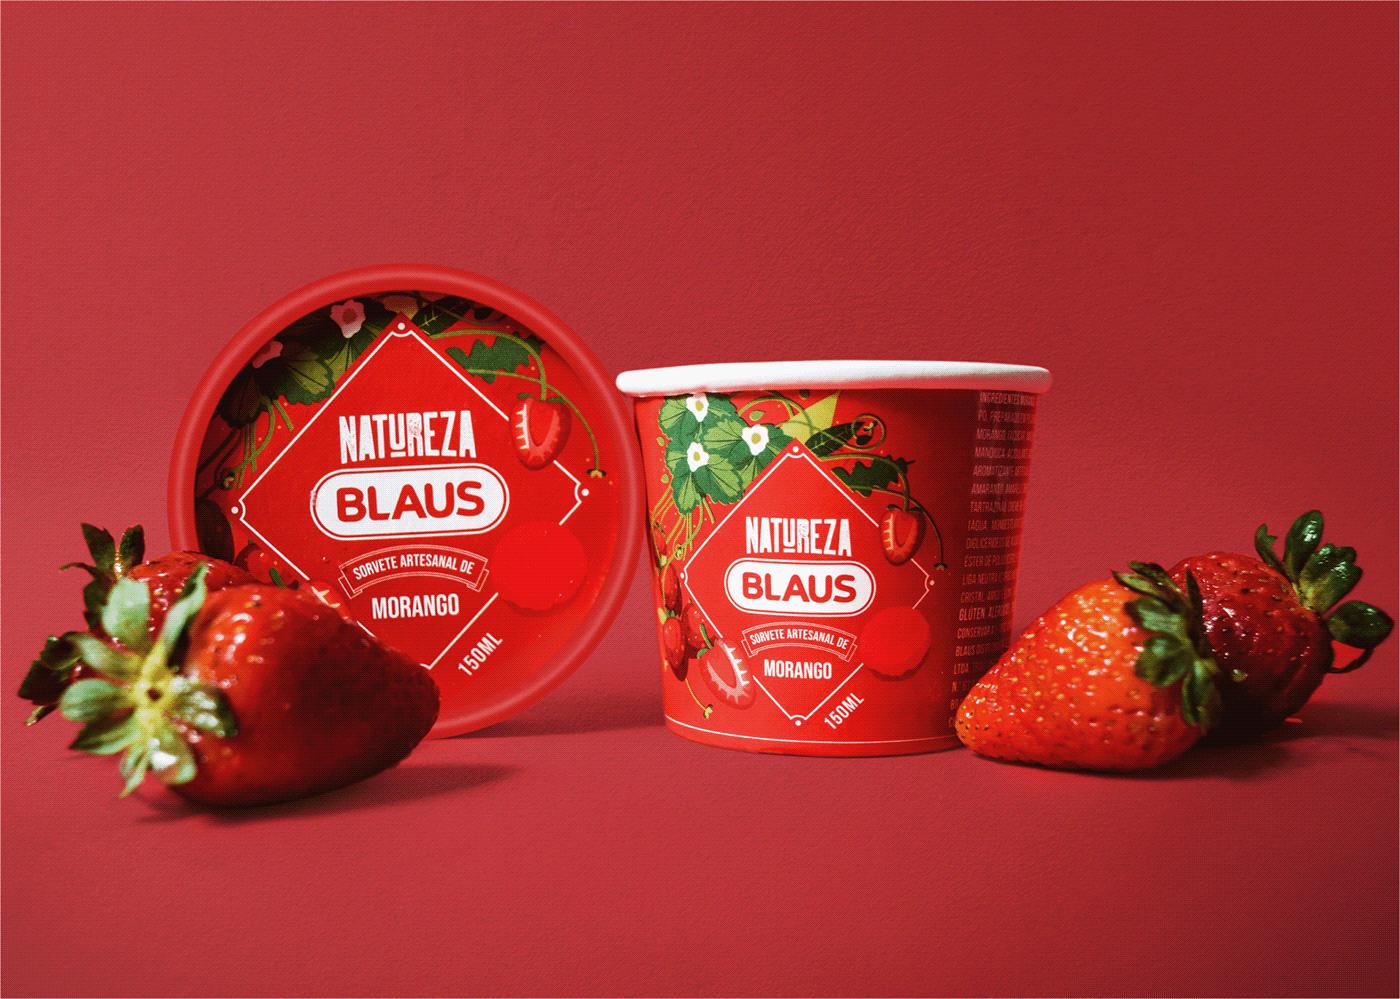 Amazon amazonia embalagem ice cream Packaging Paper Cup Sorbet ILLUSTRATION  origins